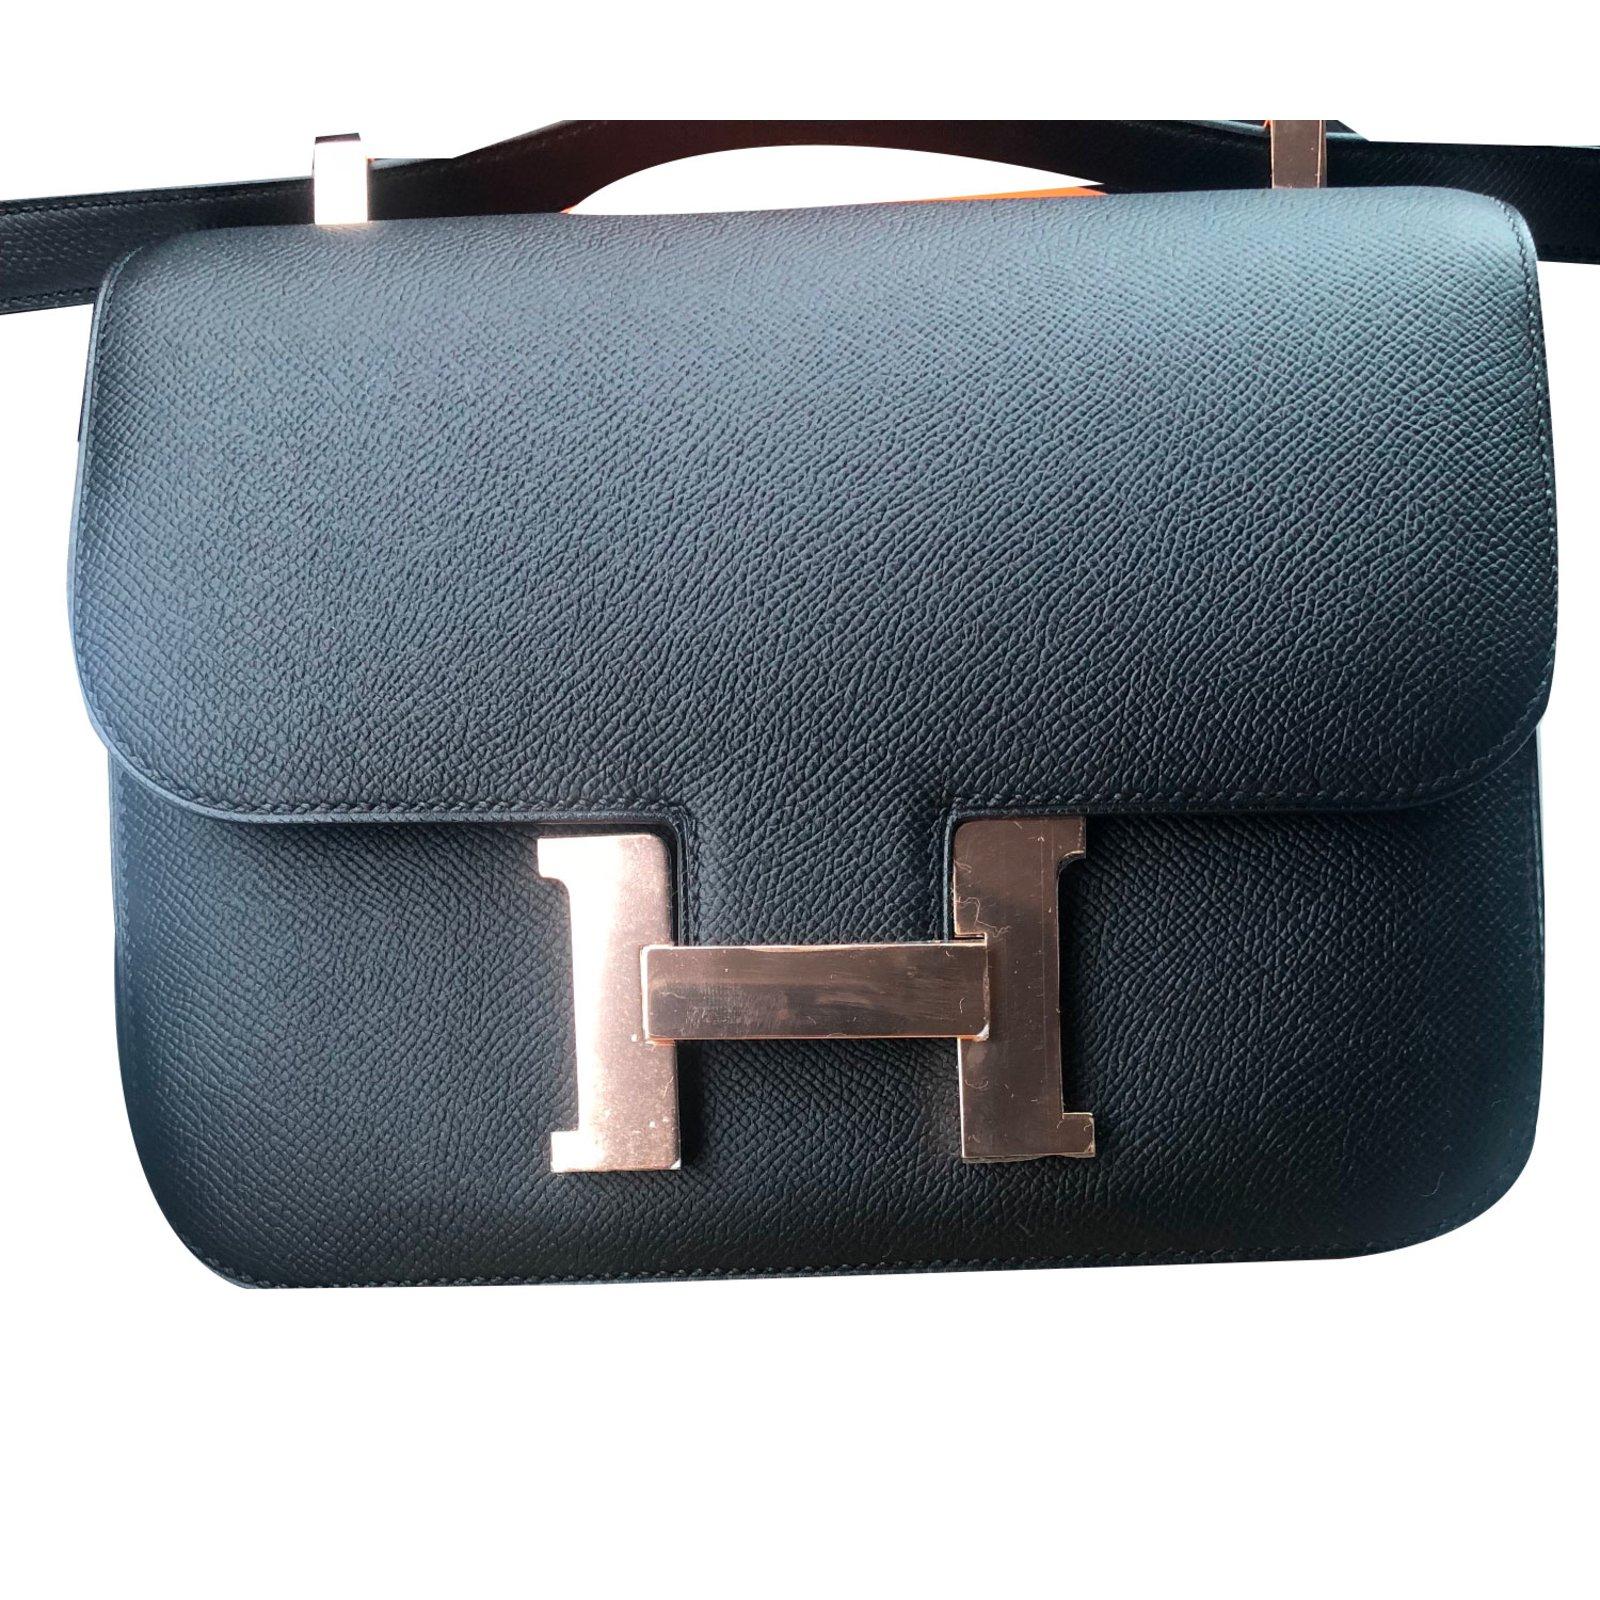 8a55f3a8461e ... order hermès constance 24 handbags leather black ref.75856 d5990 bbbcd